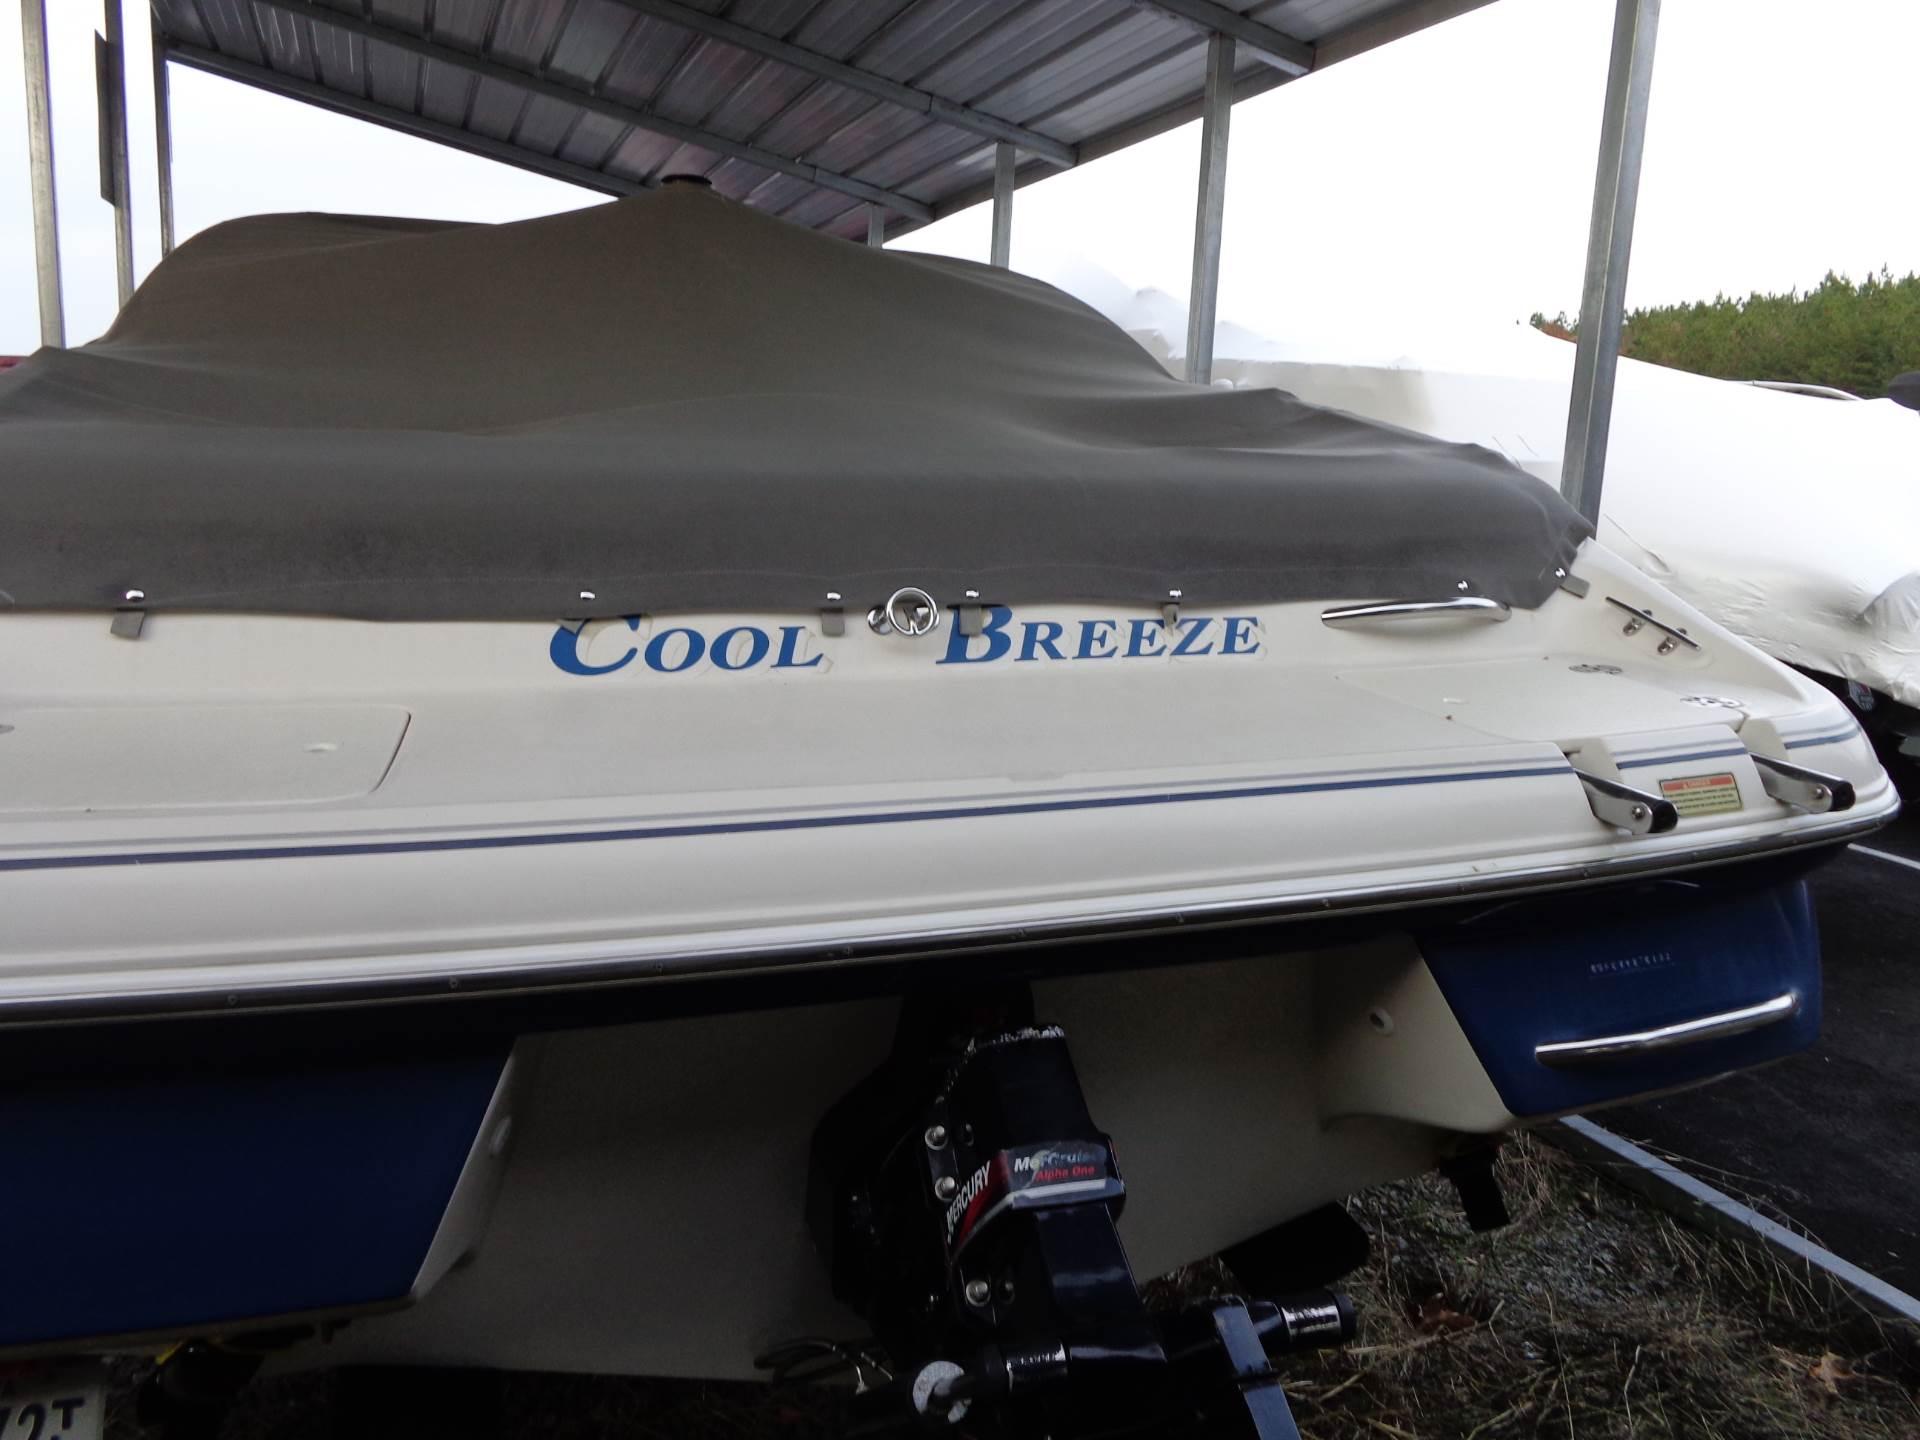 Used 2002 Monterey 190LS Montura Bowrider Power Boats Inboard In